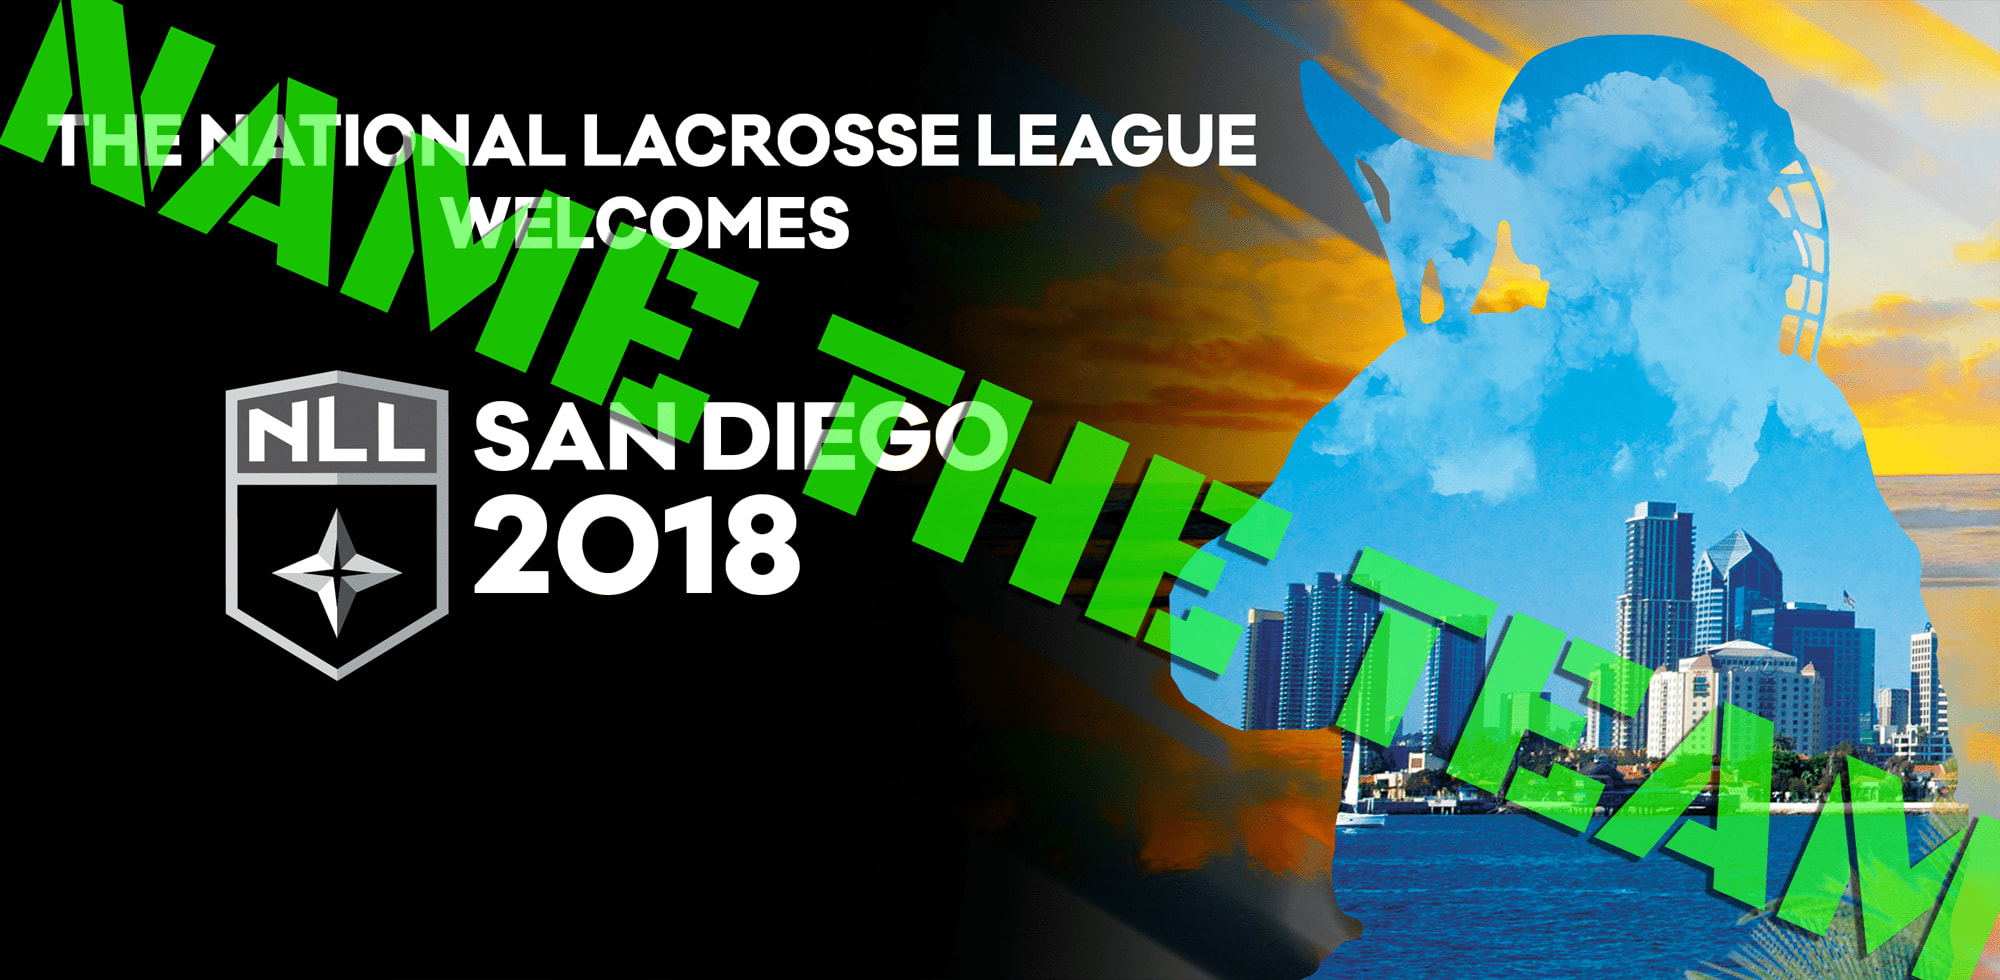 NLL SAN DIEGO: Name The Team